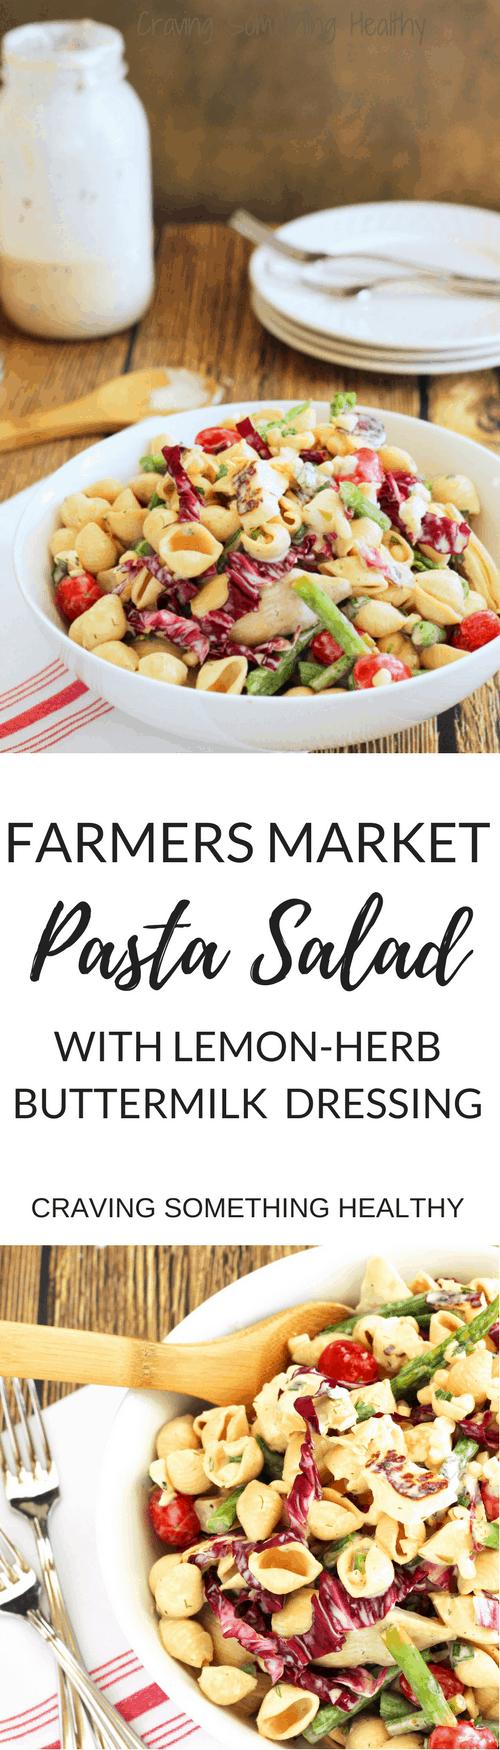 Watch Farmers Market Pasta Salad video